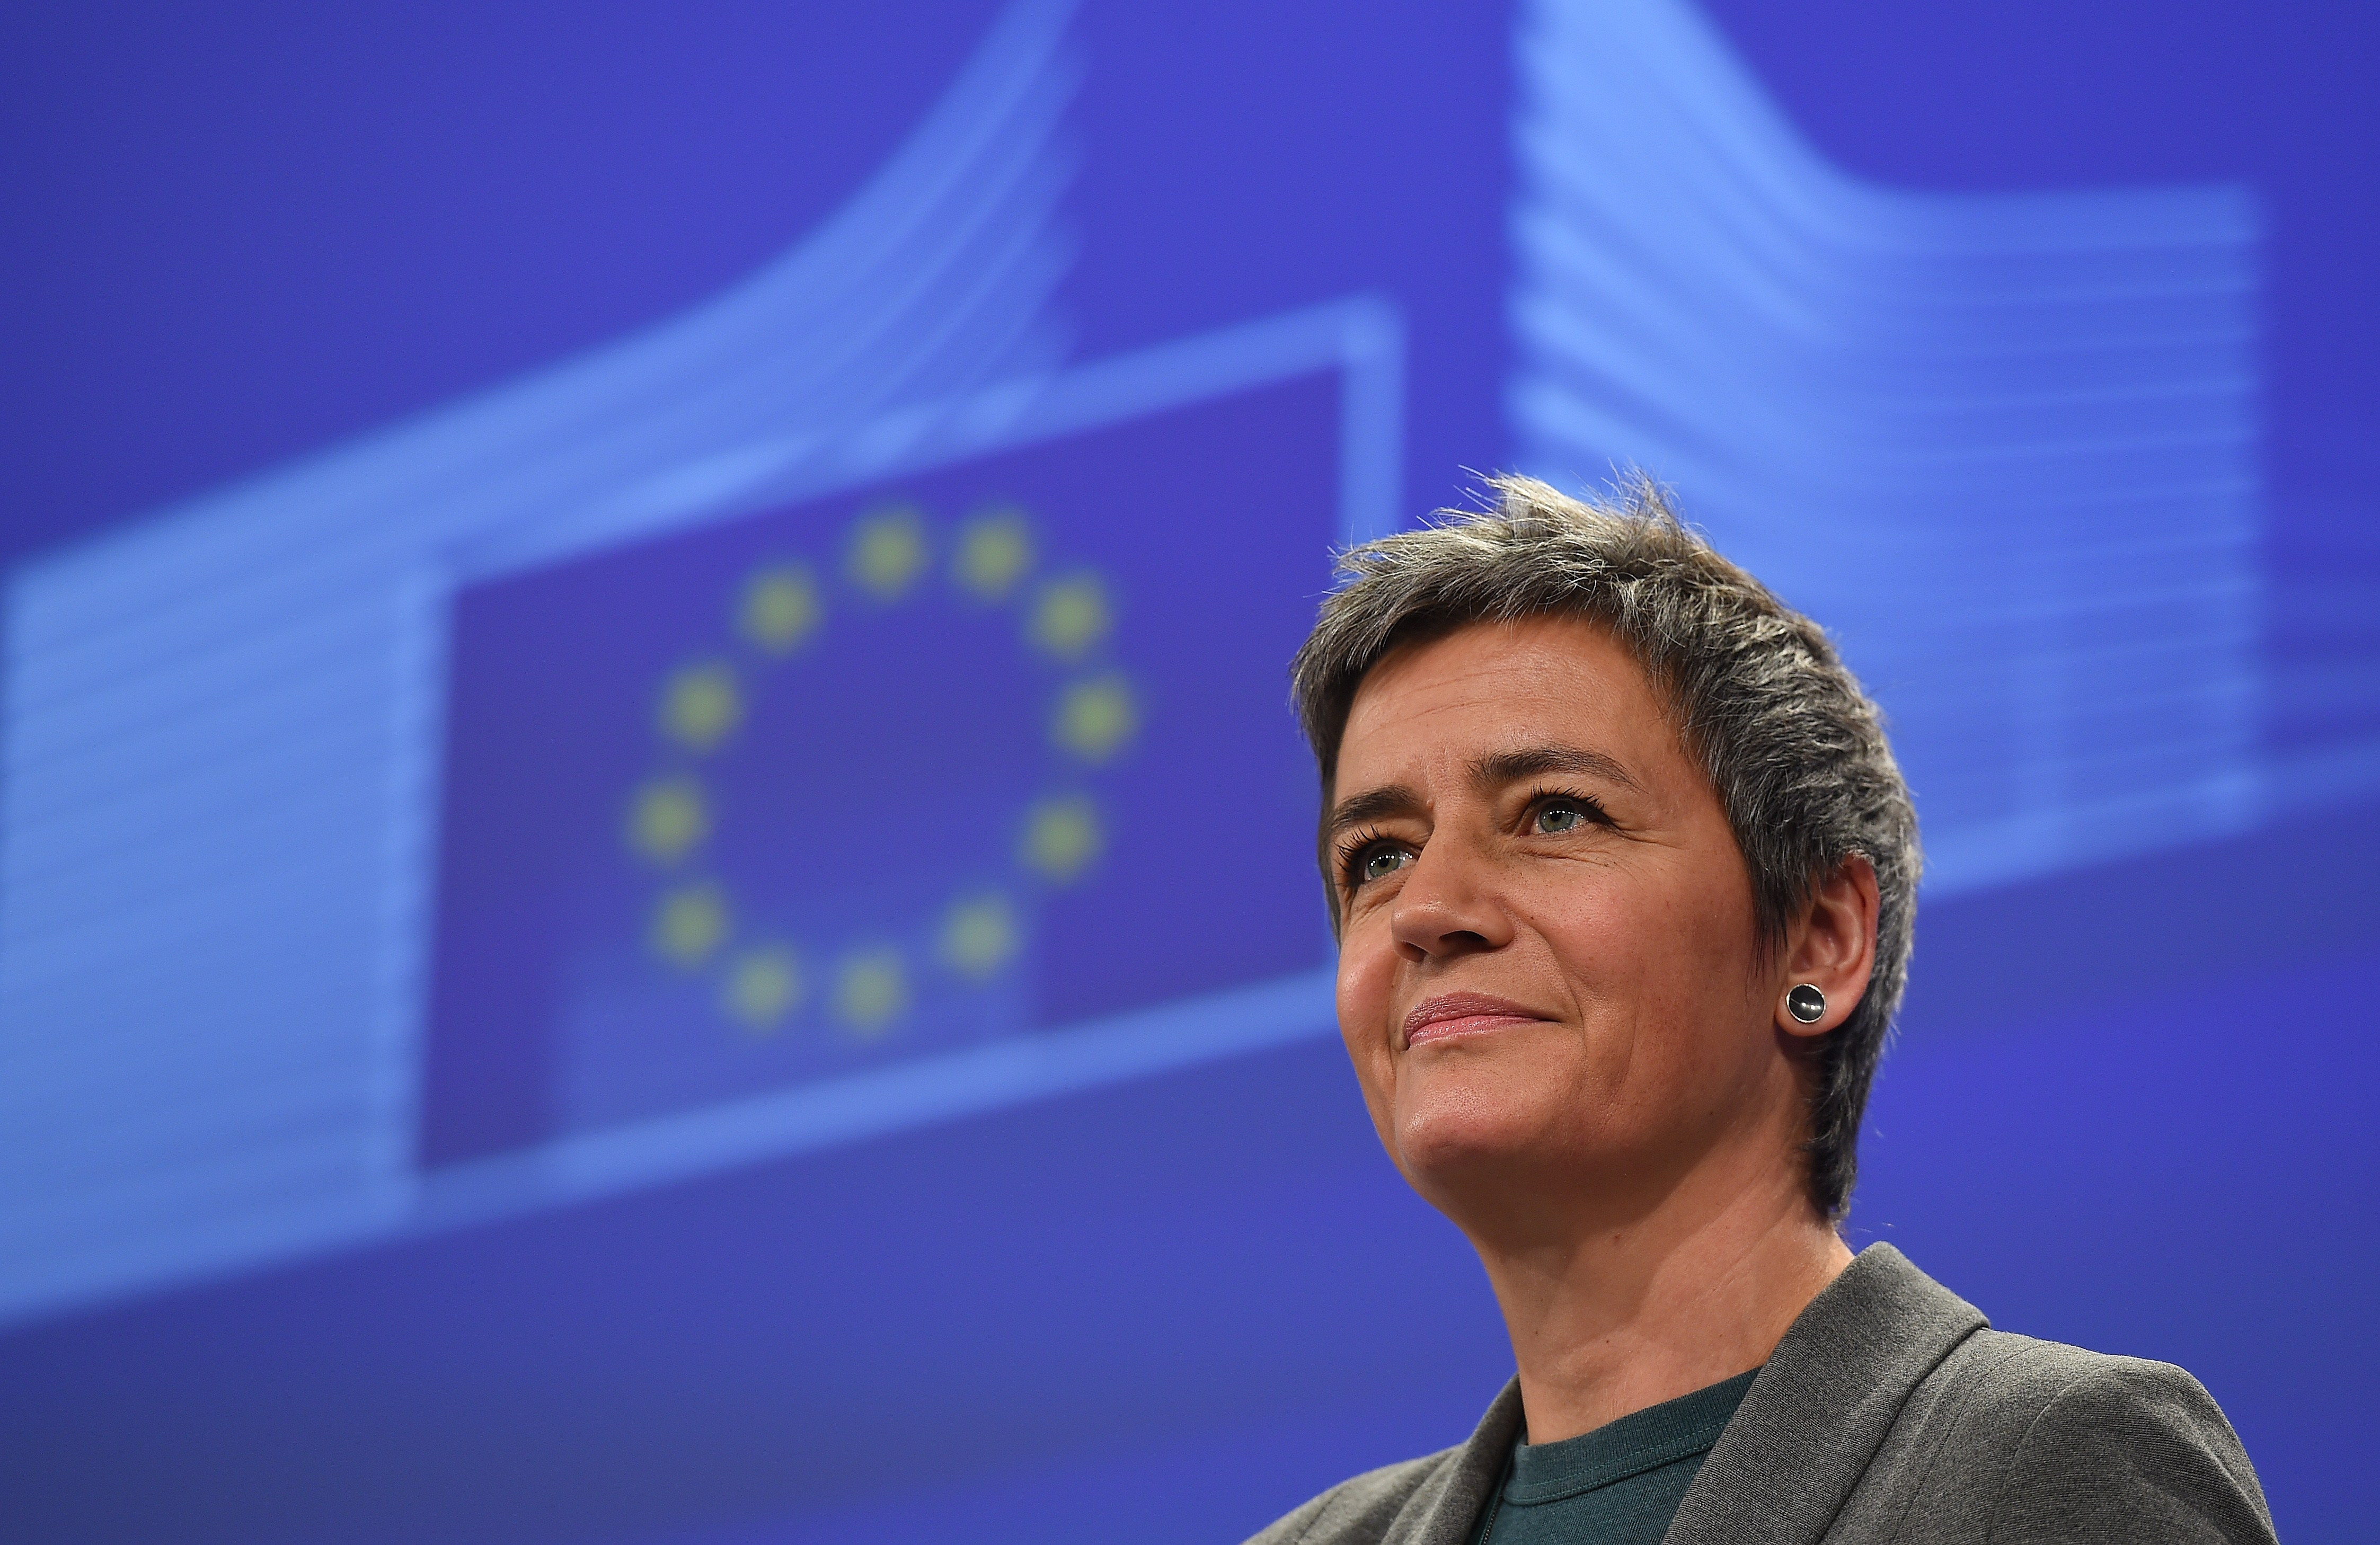 BELGIUM-EU-COMPETITION-VESTAGER